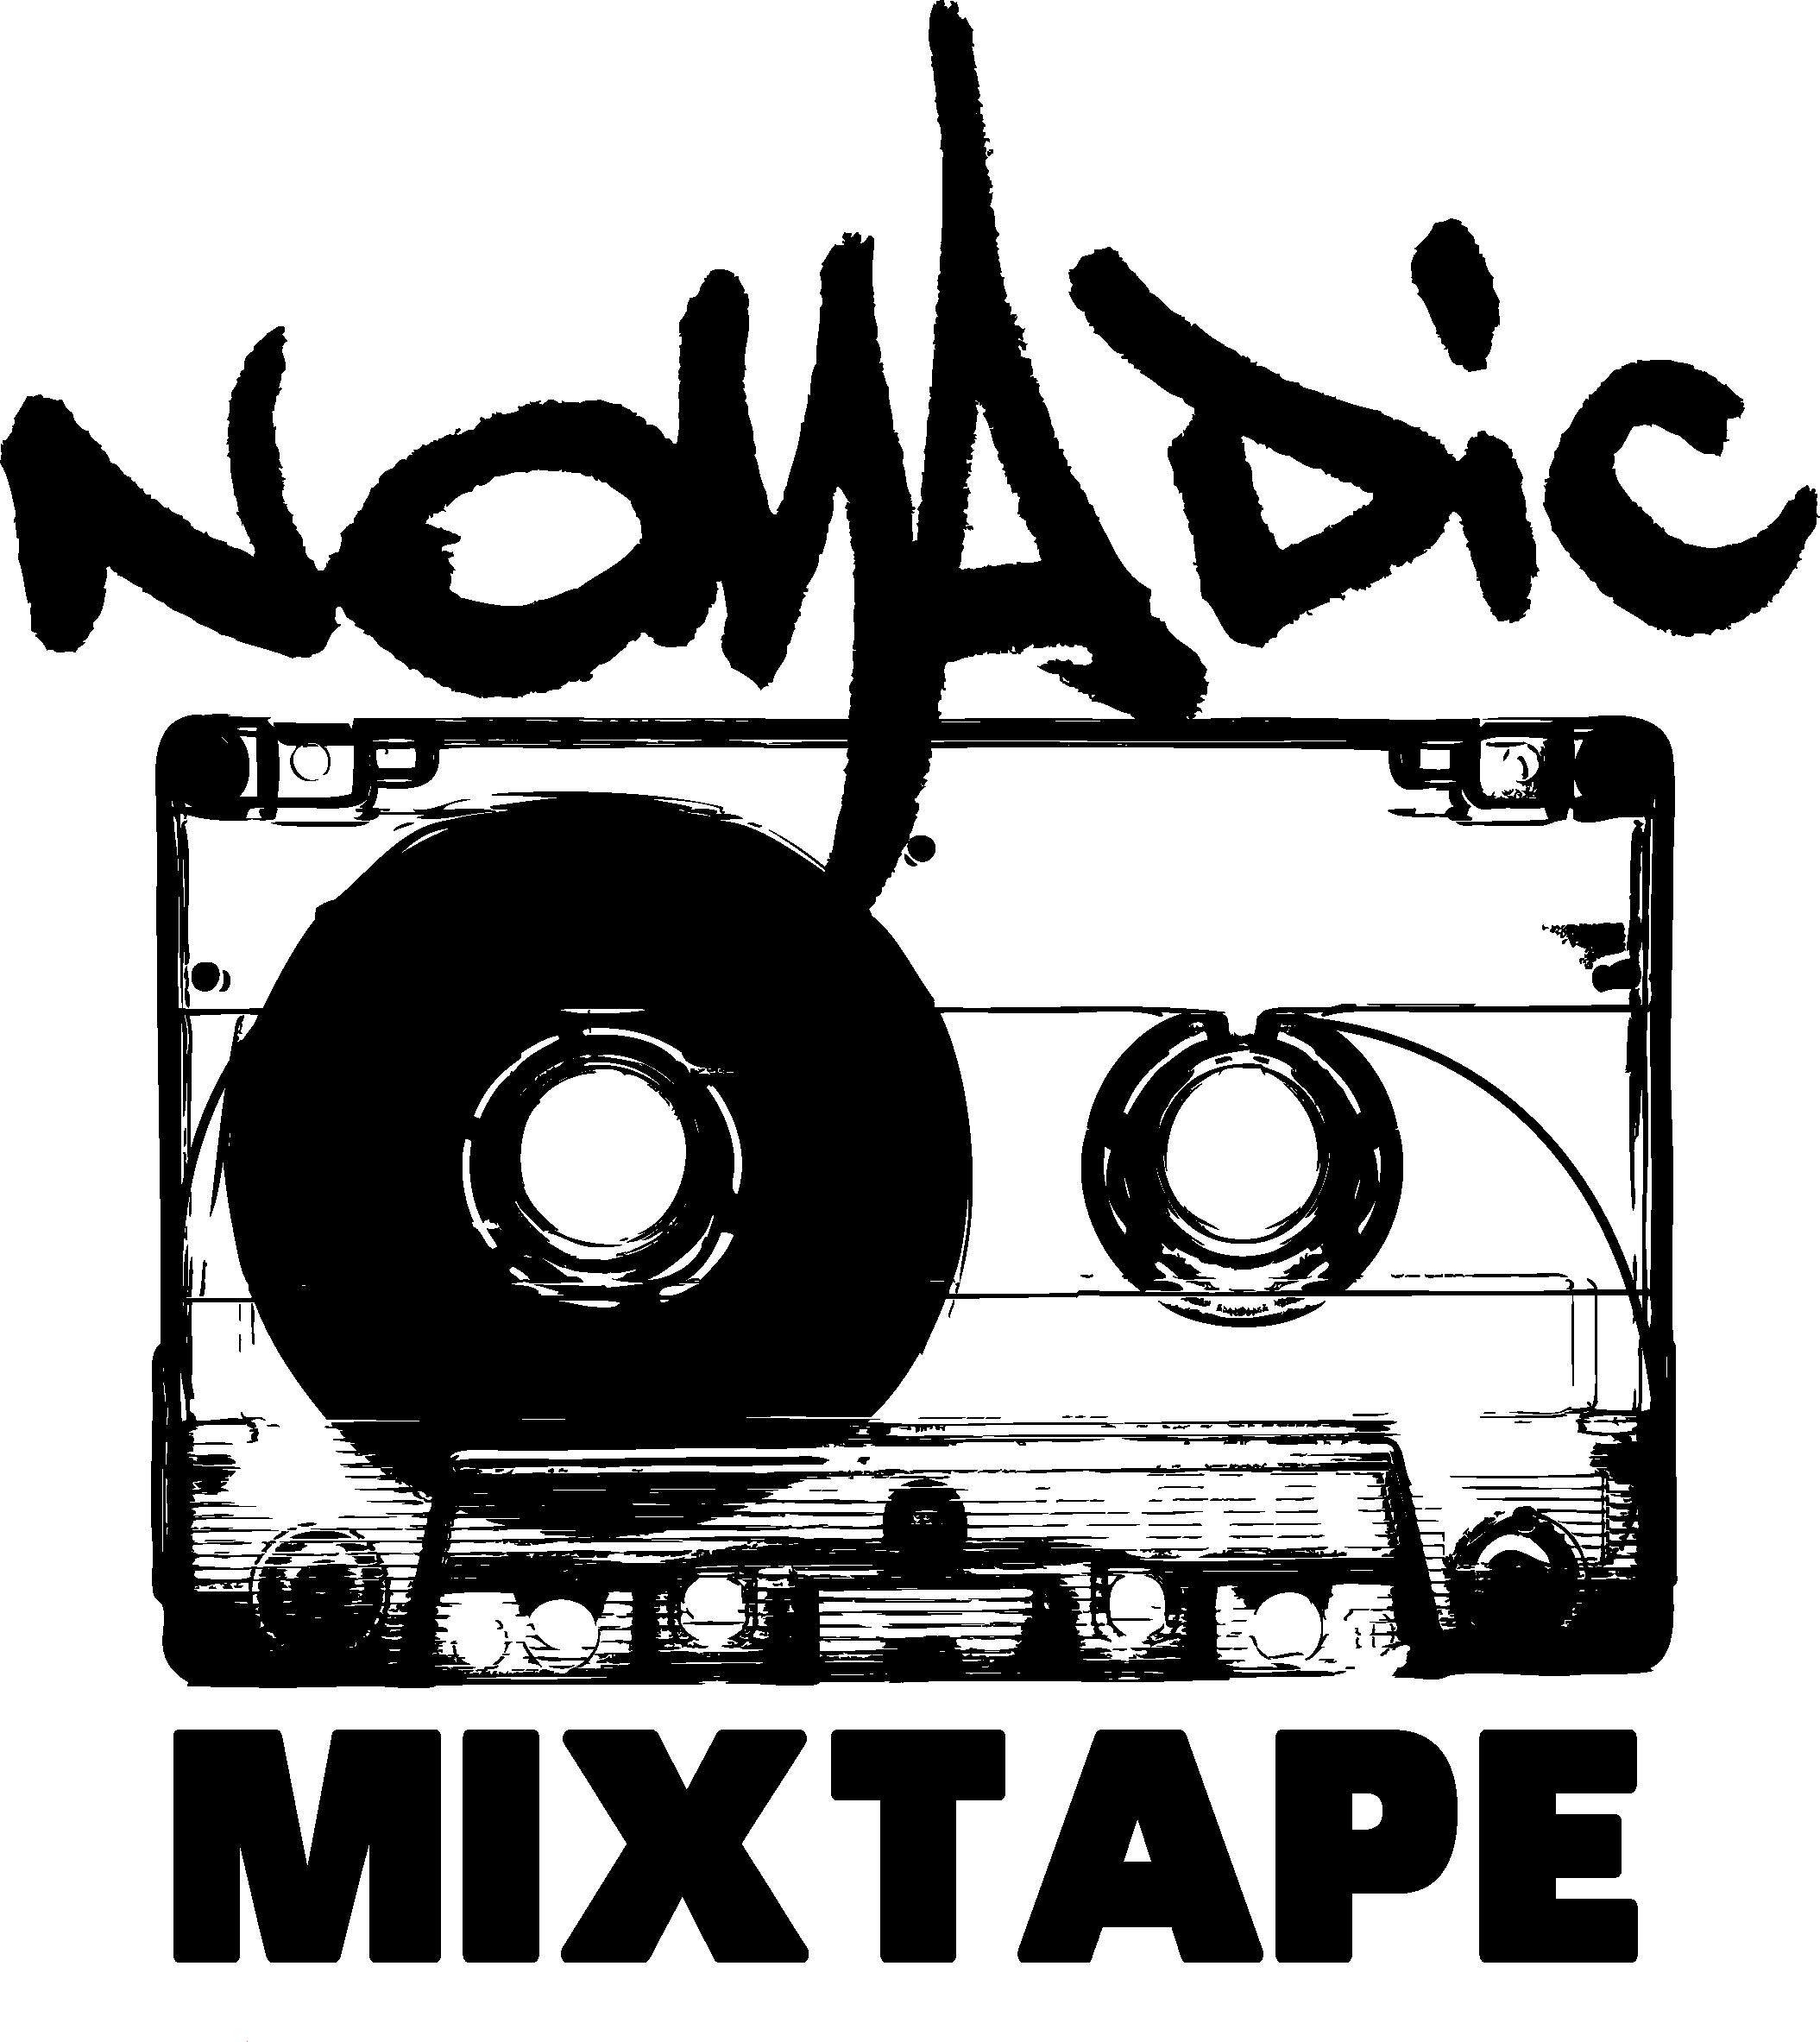 Nomadic Mixtape (U.S.A.)